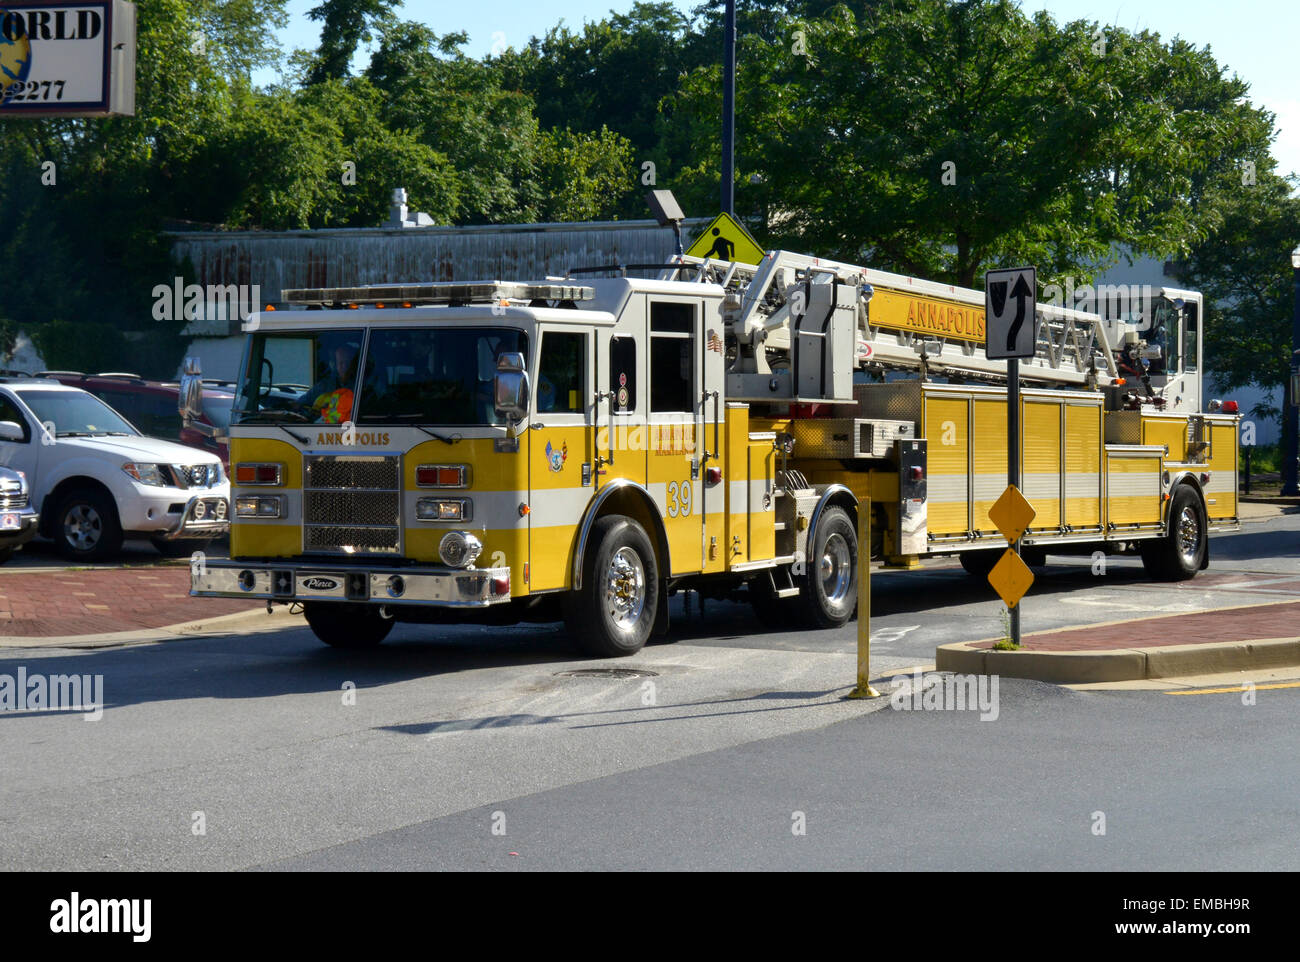 pompiere hook up